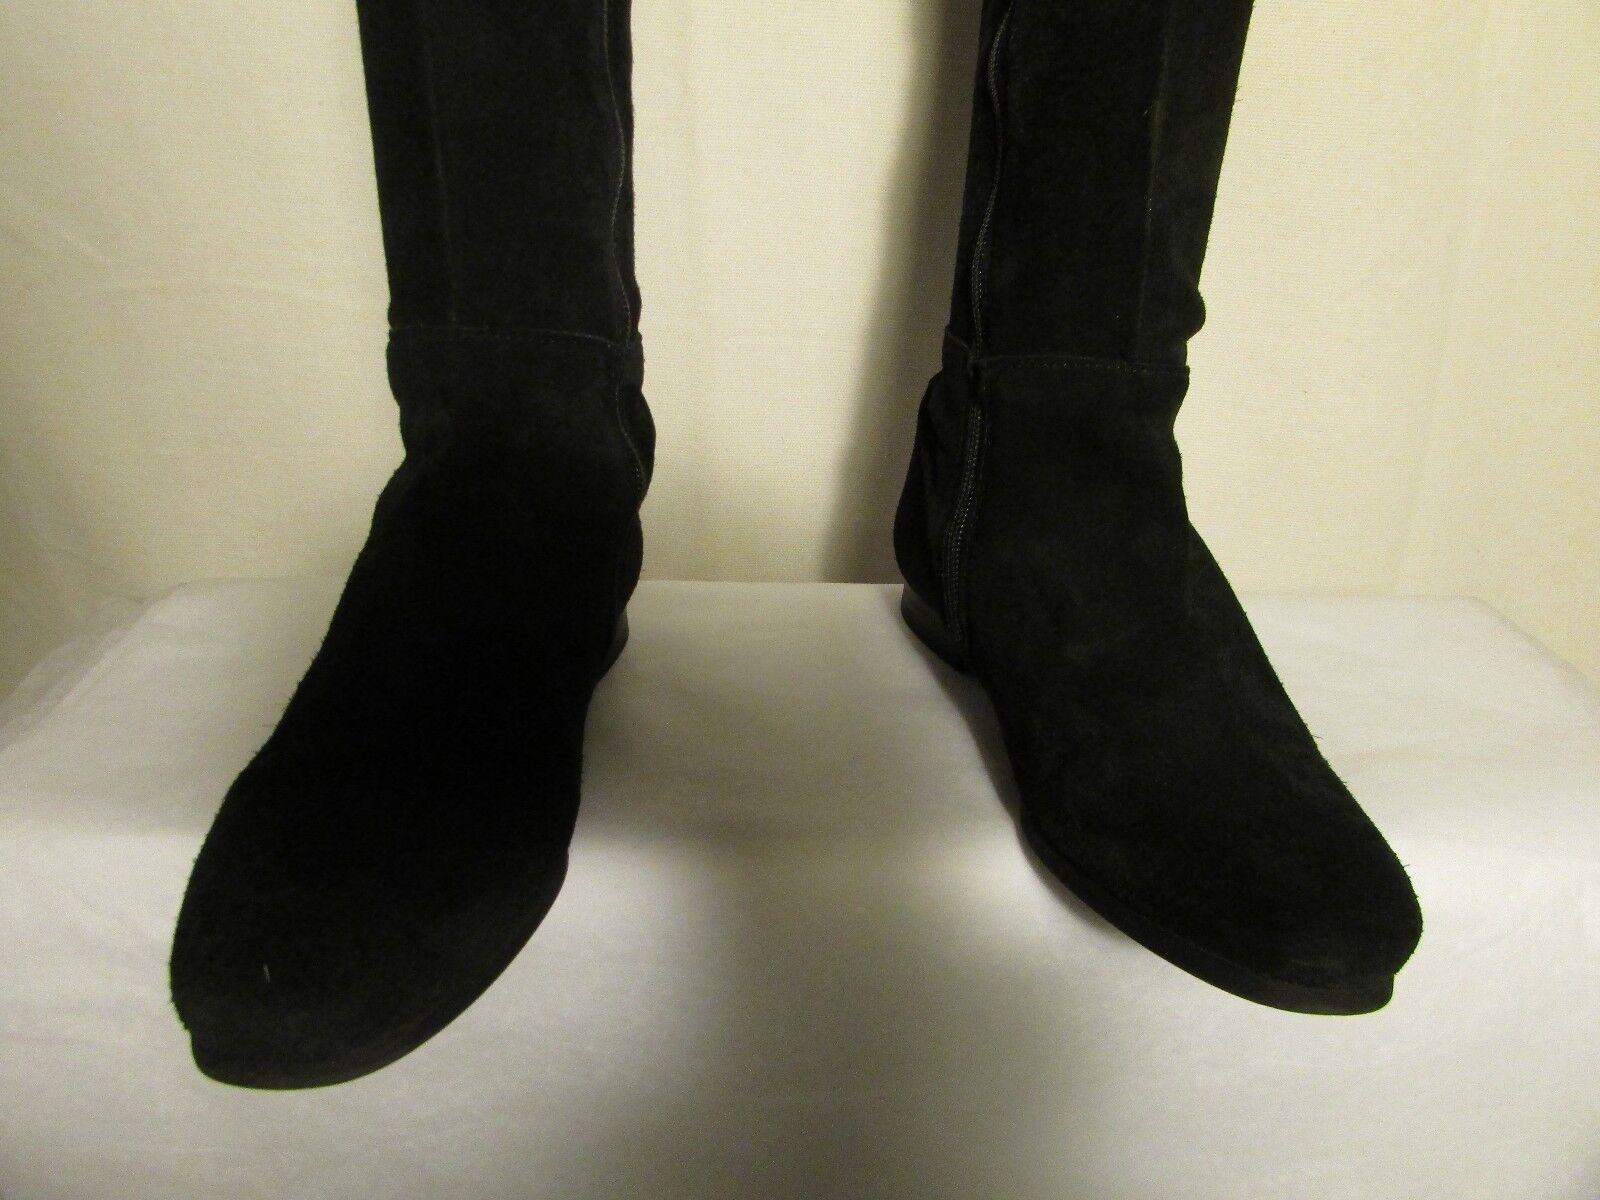 hohe Stiefel DMN Wildleder Wildleder DMN schwarz 36 2aa1d5